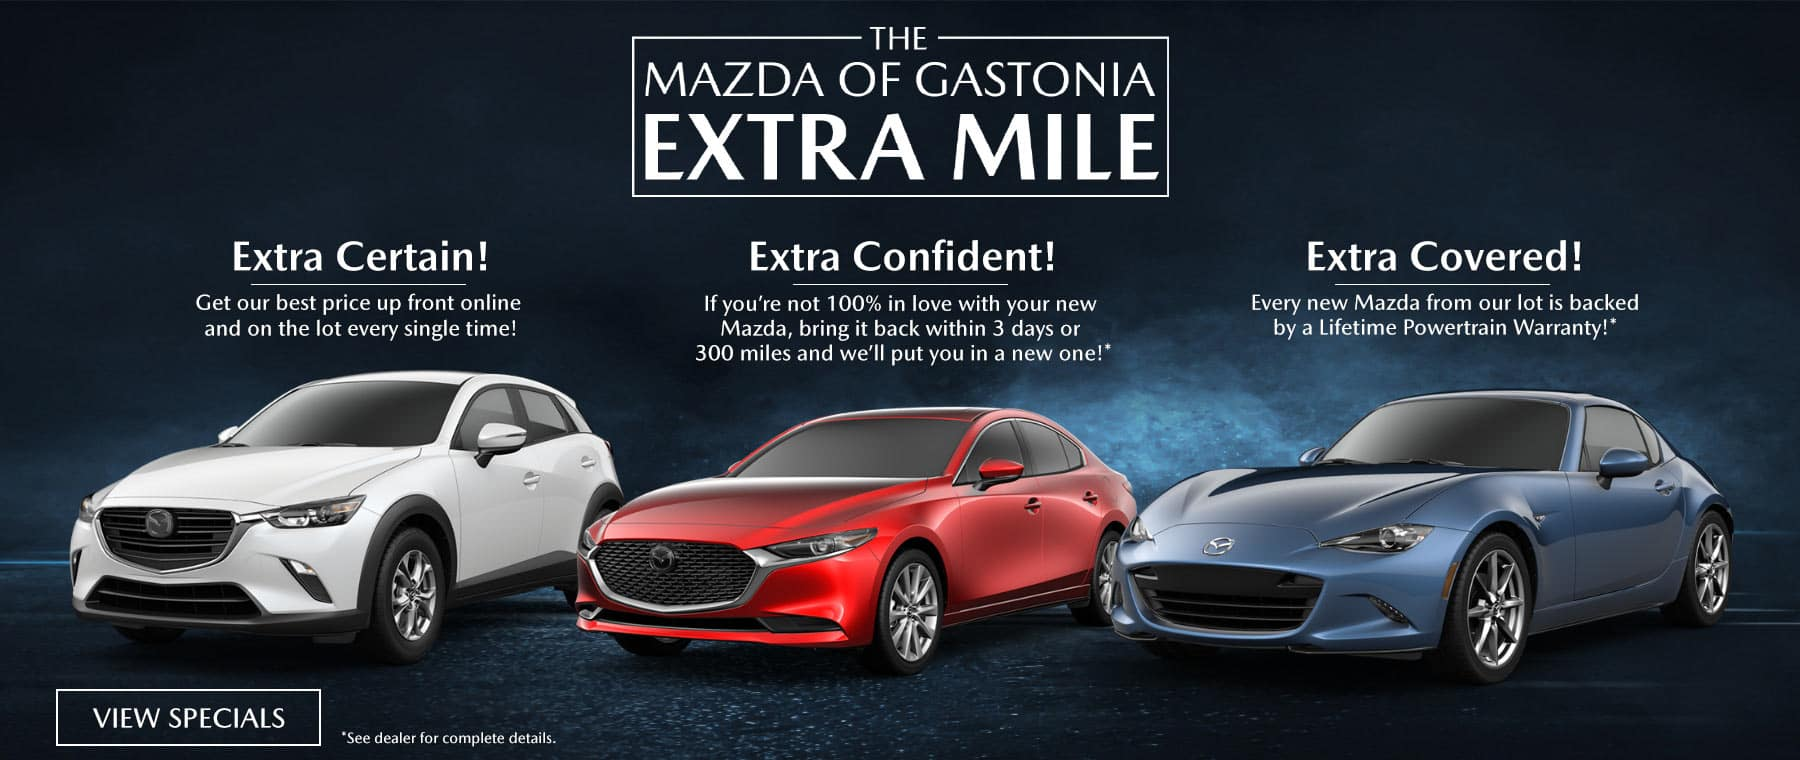 MazdaGastonia_USP-Slide_1800x760_03-2021 (1)